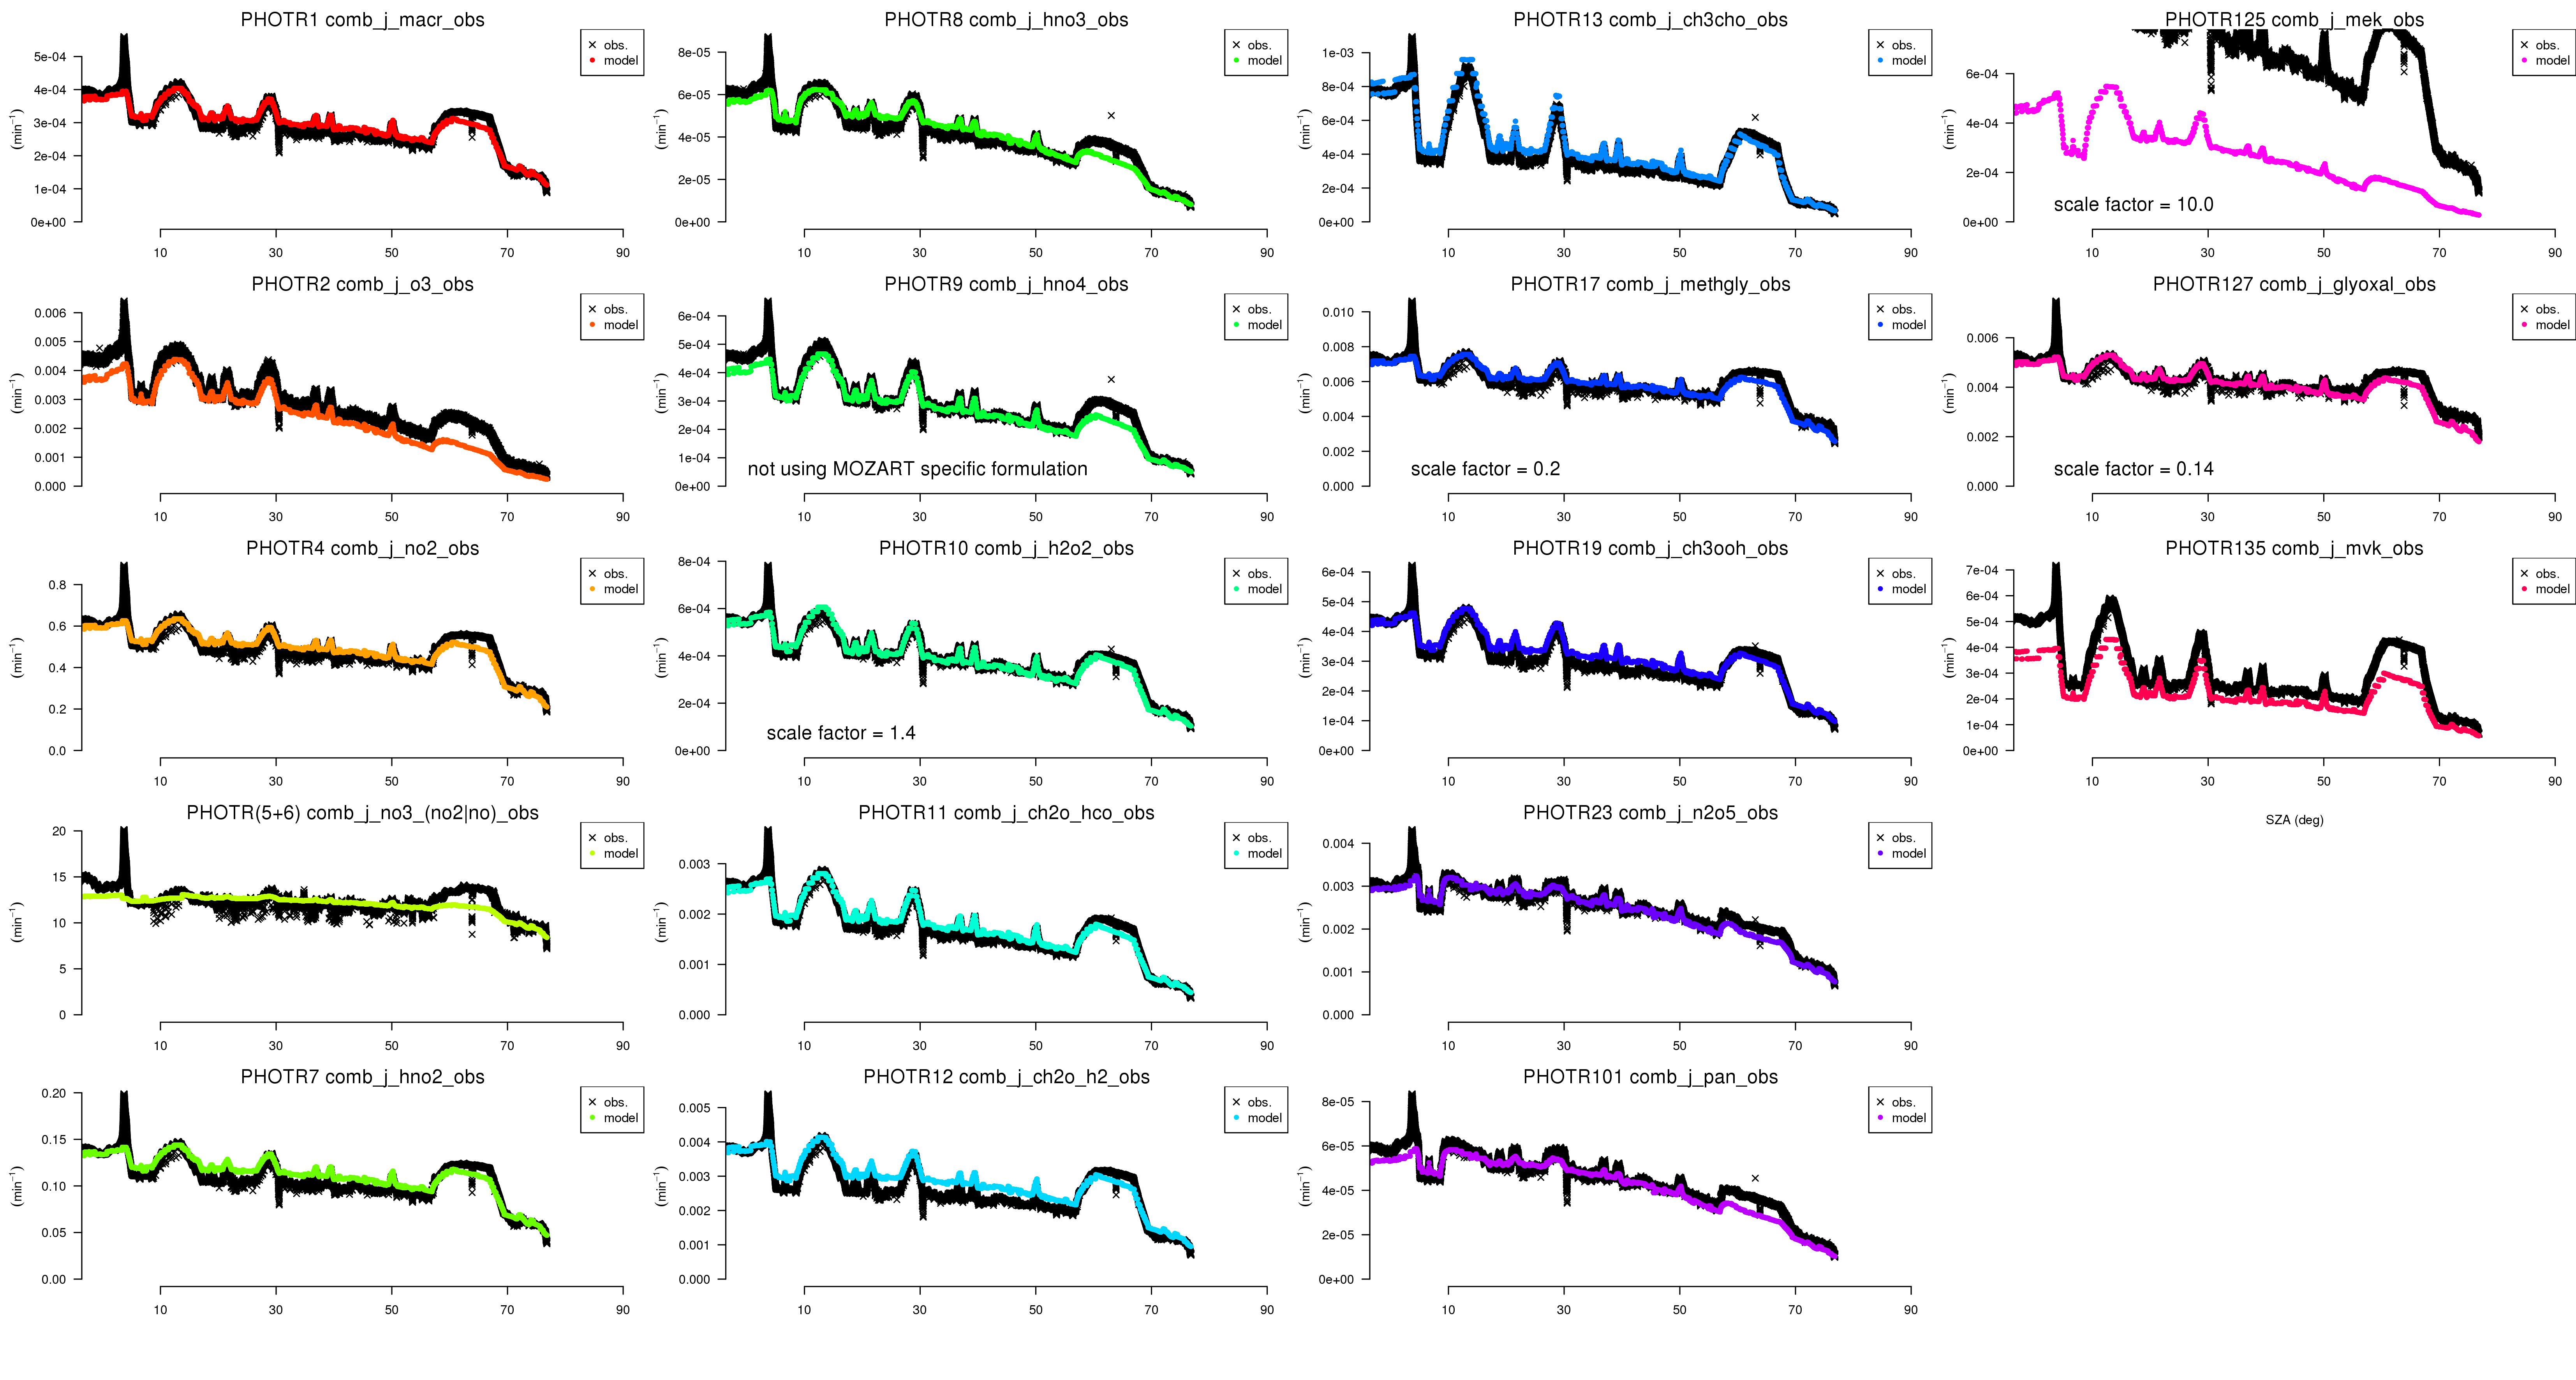 WRF/Chem at NCAR - AQMEII-2 project wiki